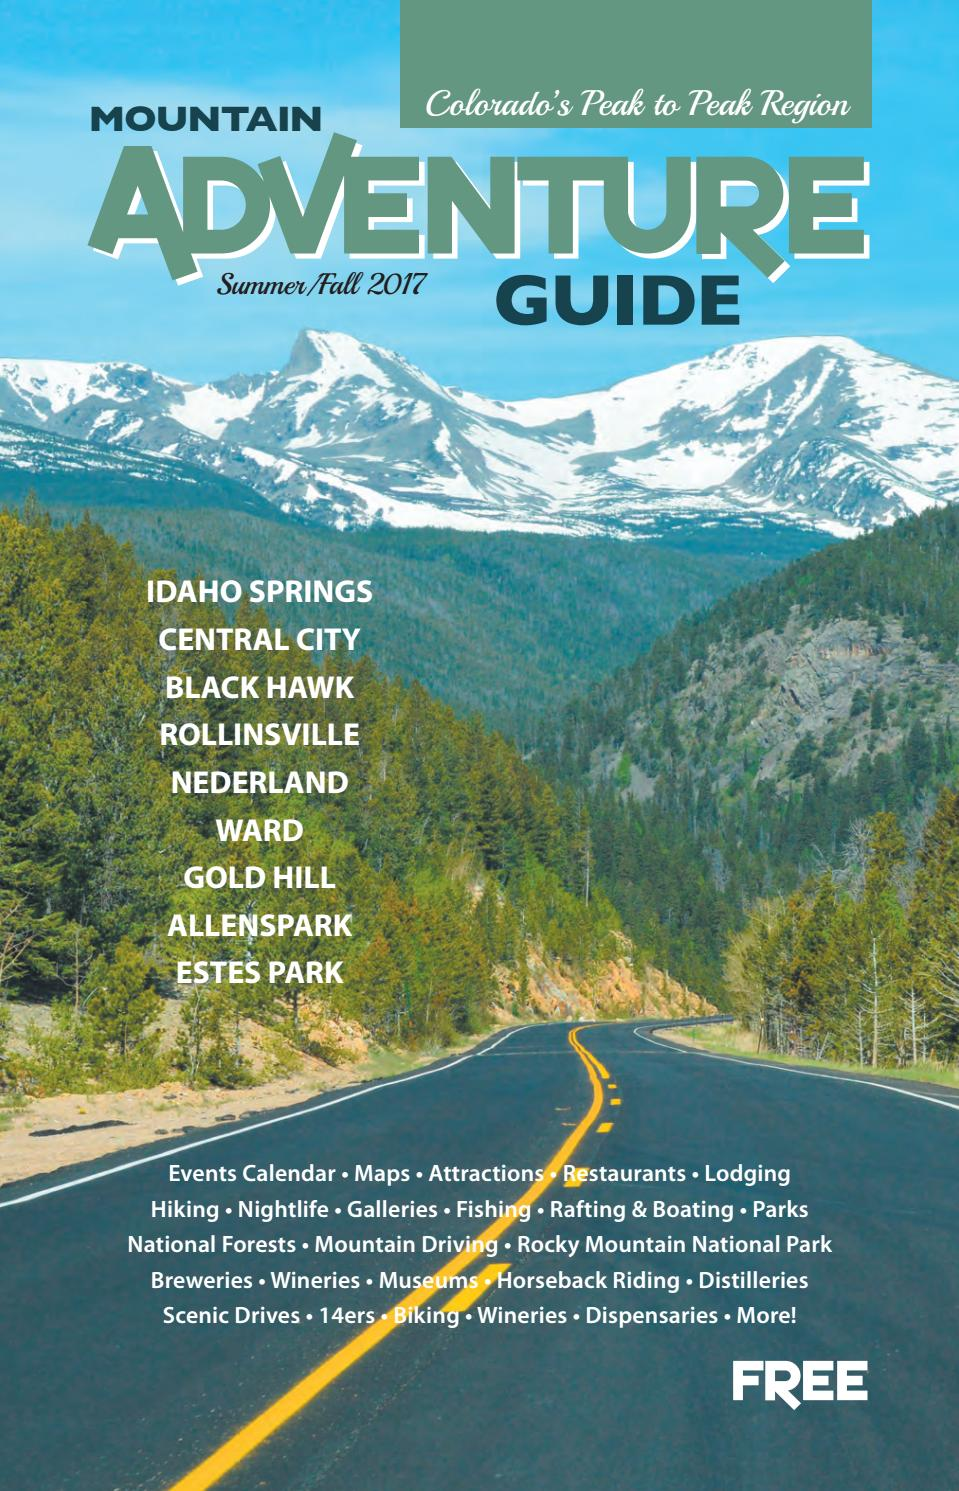 Mountain Adventure Guide - Peak to Peak: Summer/Fall 2017 by